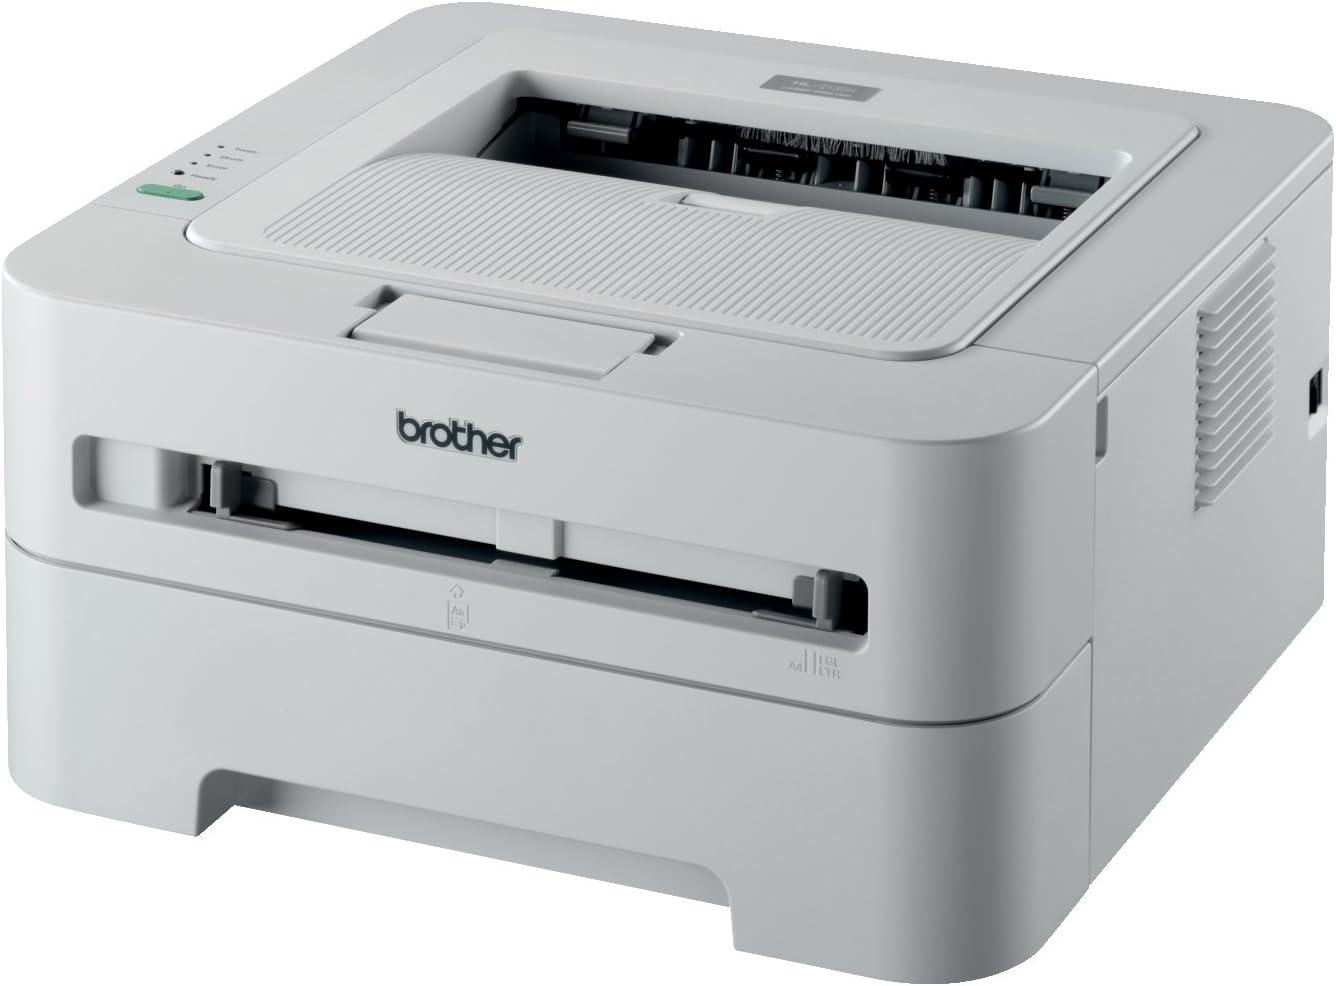 Brother HL2135W - Impresora láser Blanco y Negro (A4, 20 ppm, WiFi ...